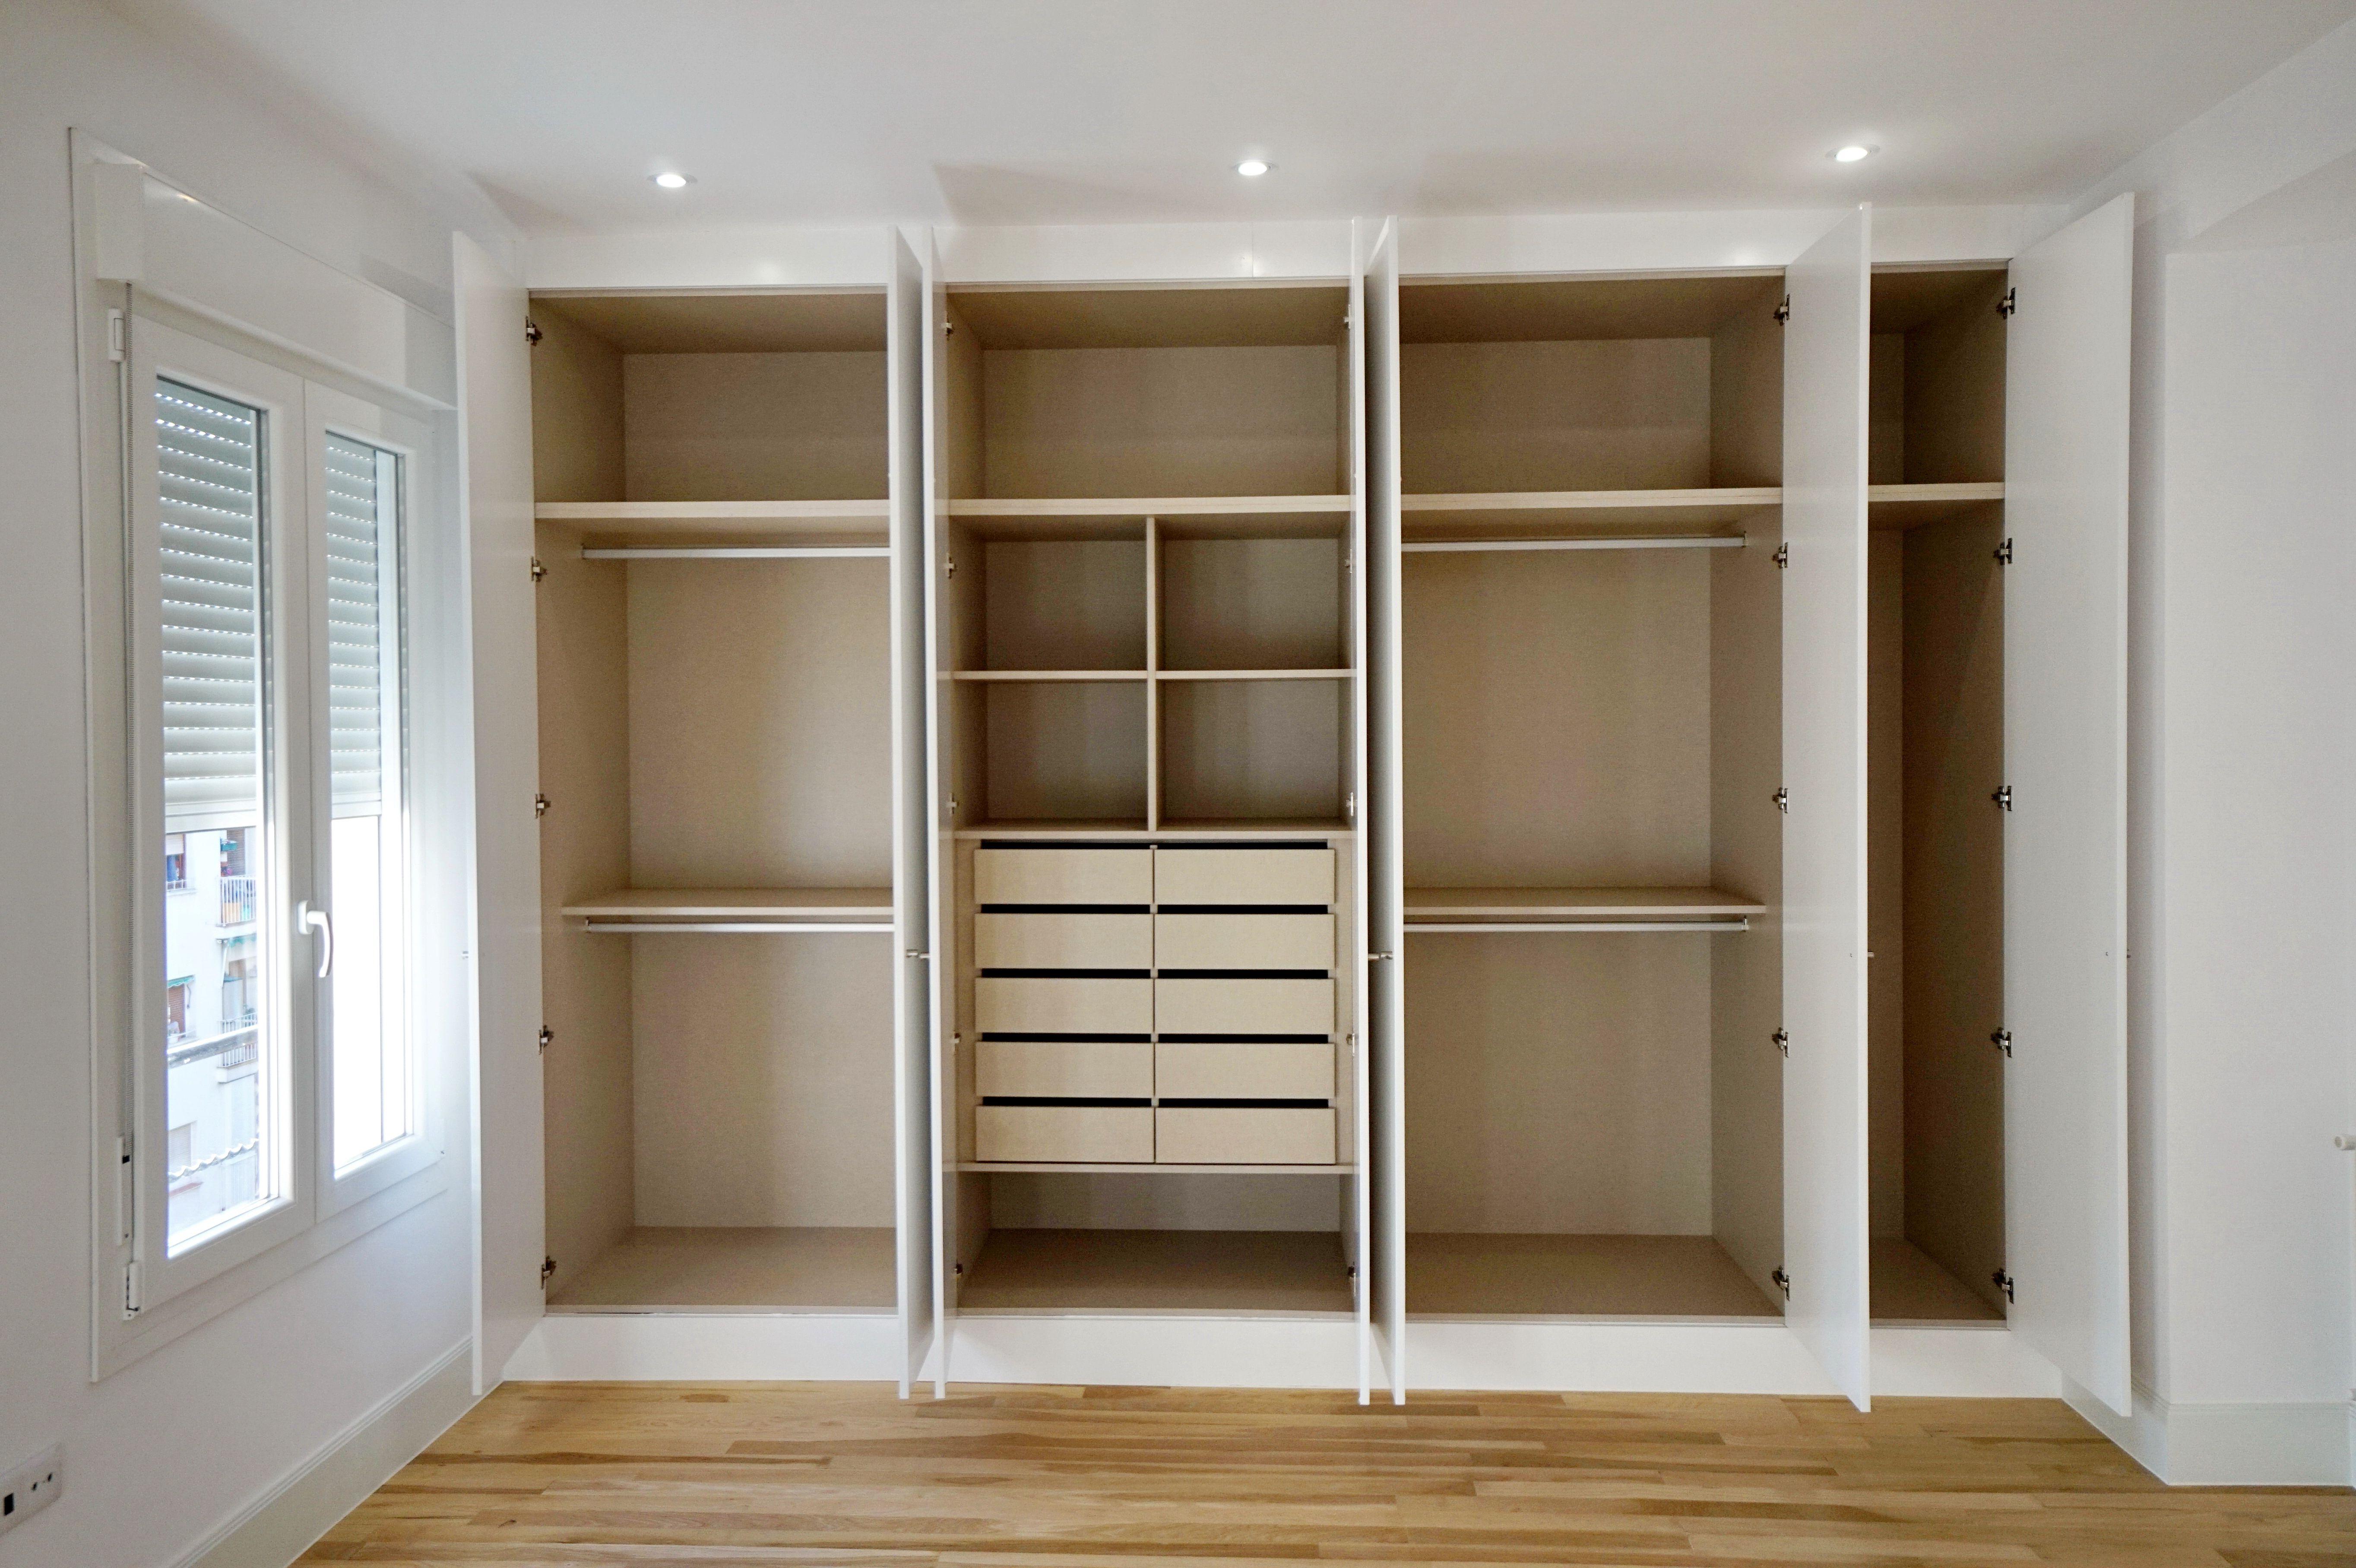 Armarios a medida lacados en blanco e interiores en for Armarios altos para dormitorio